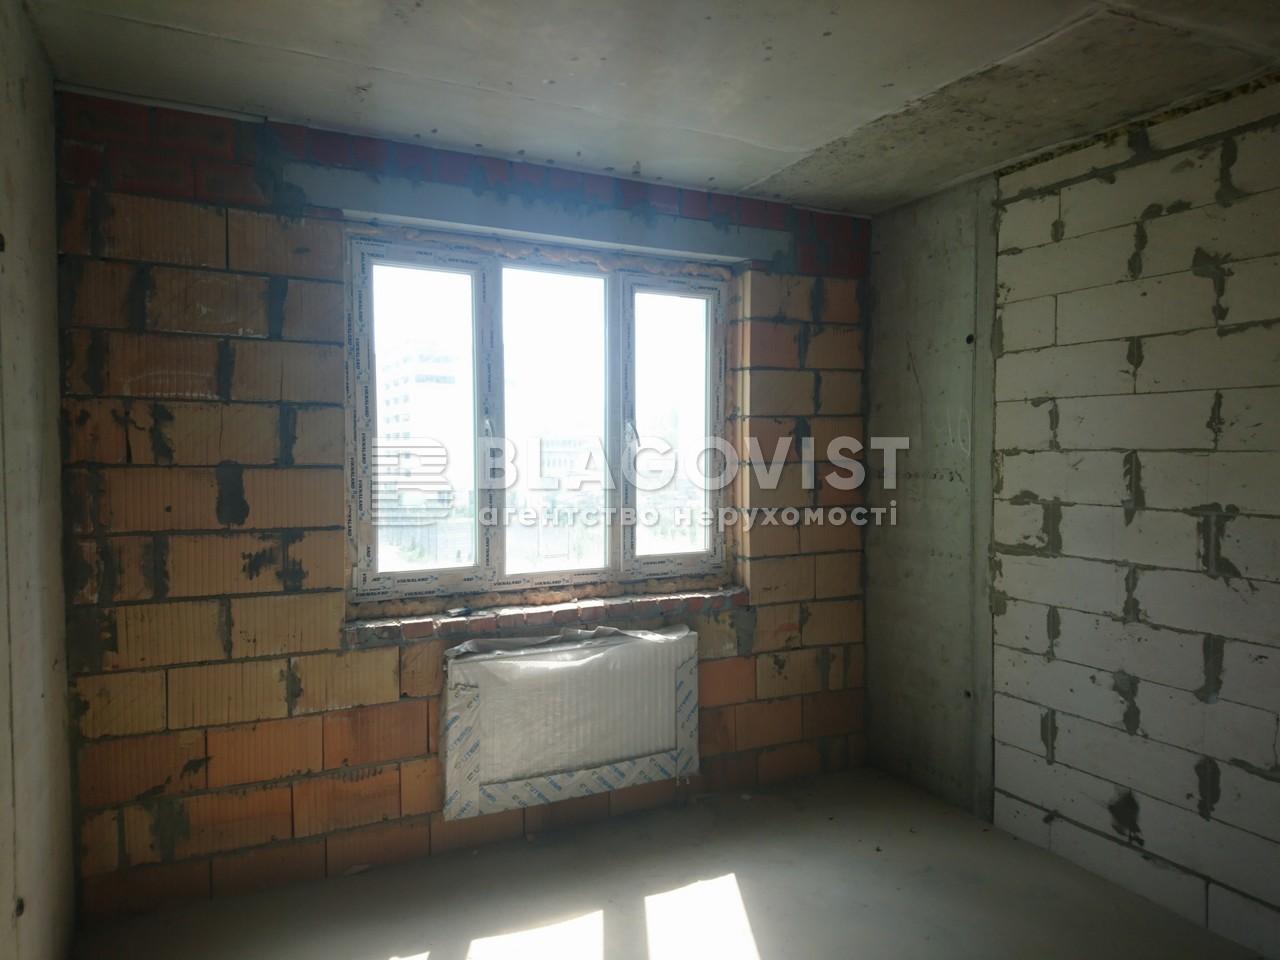 Квартира F-41861, Воскресенская, 18, Киев - Фото 10